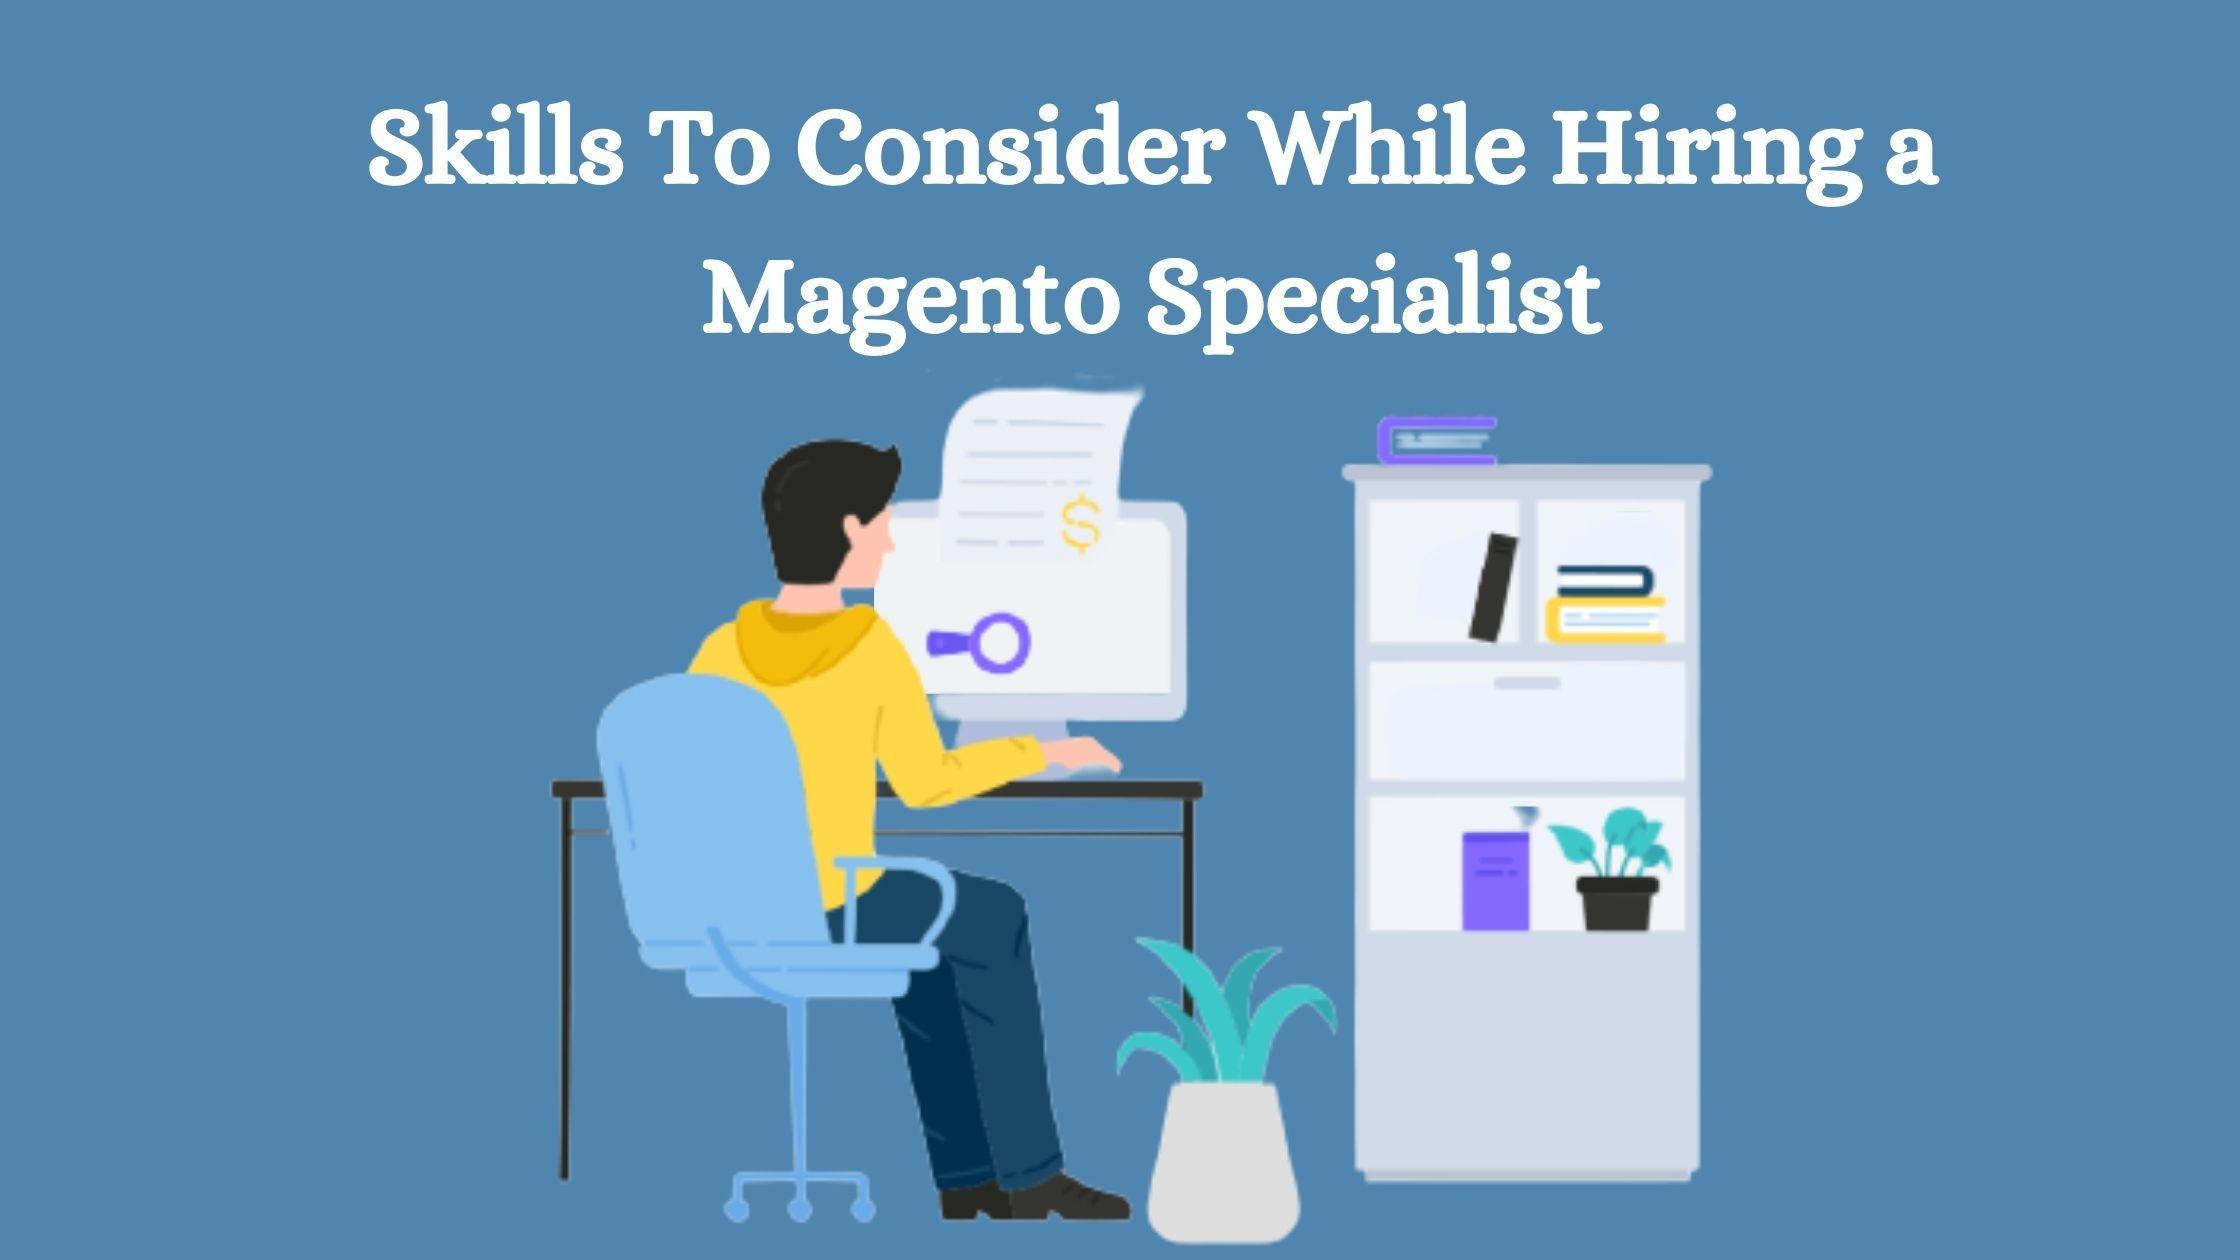 Magento specialist